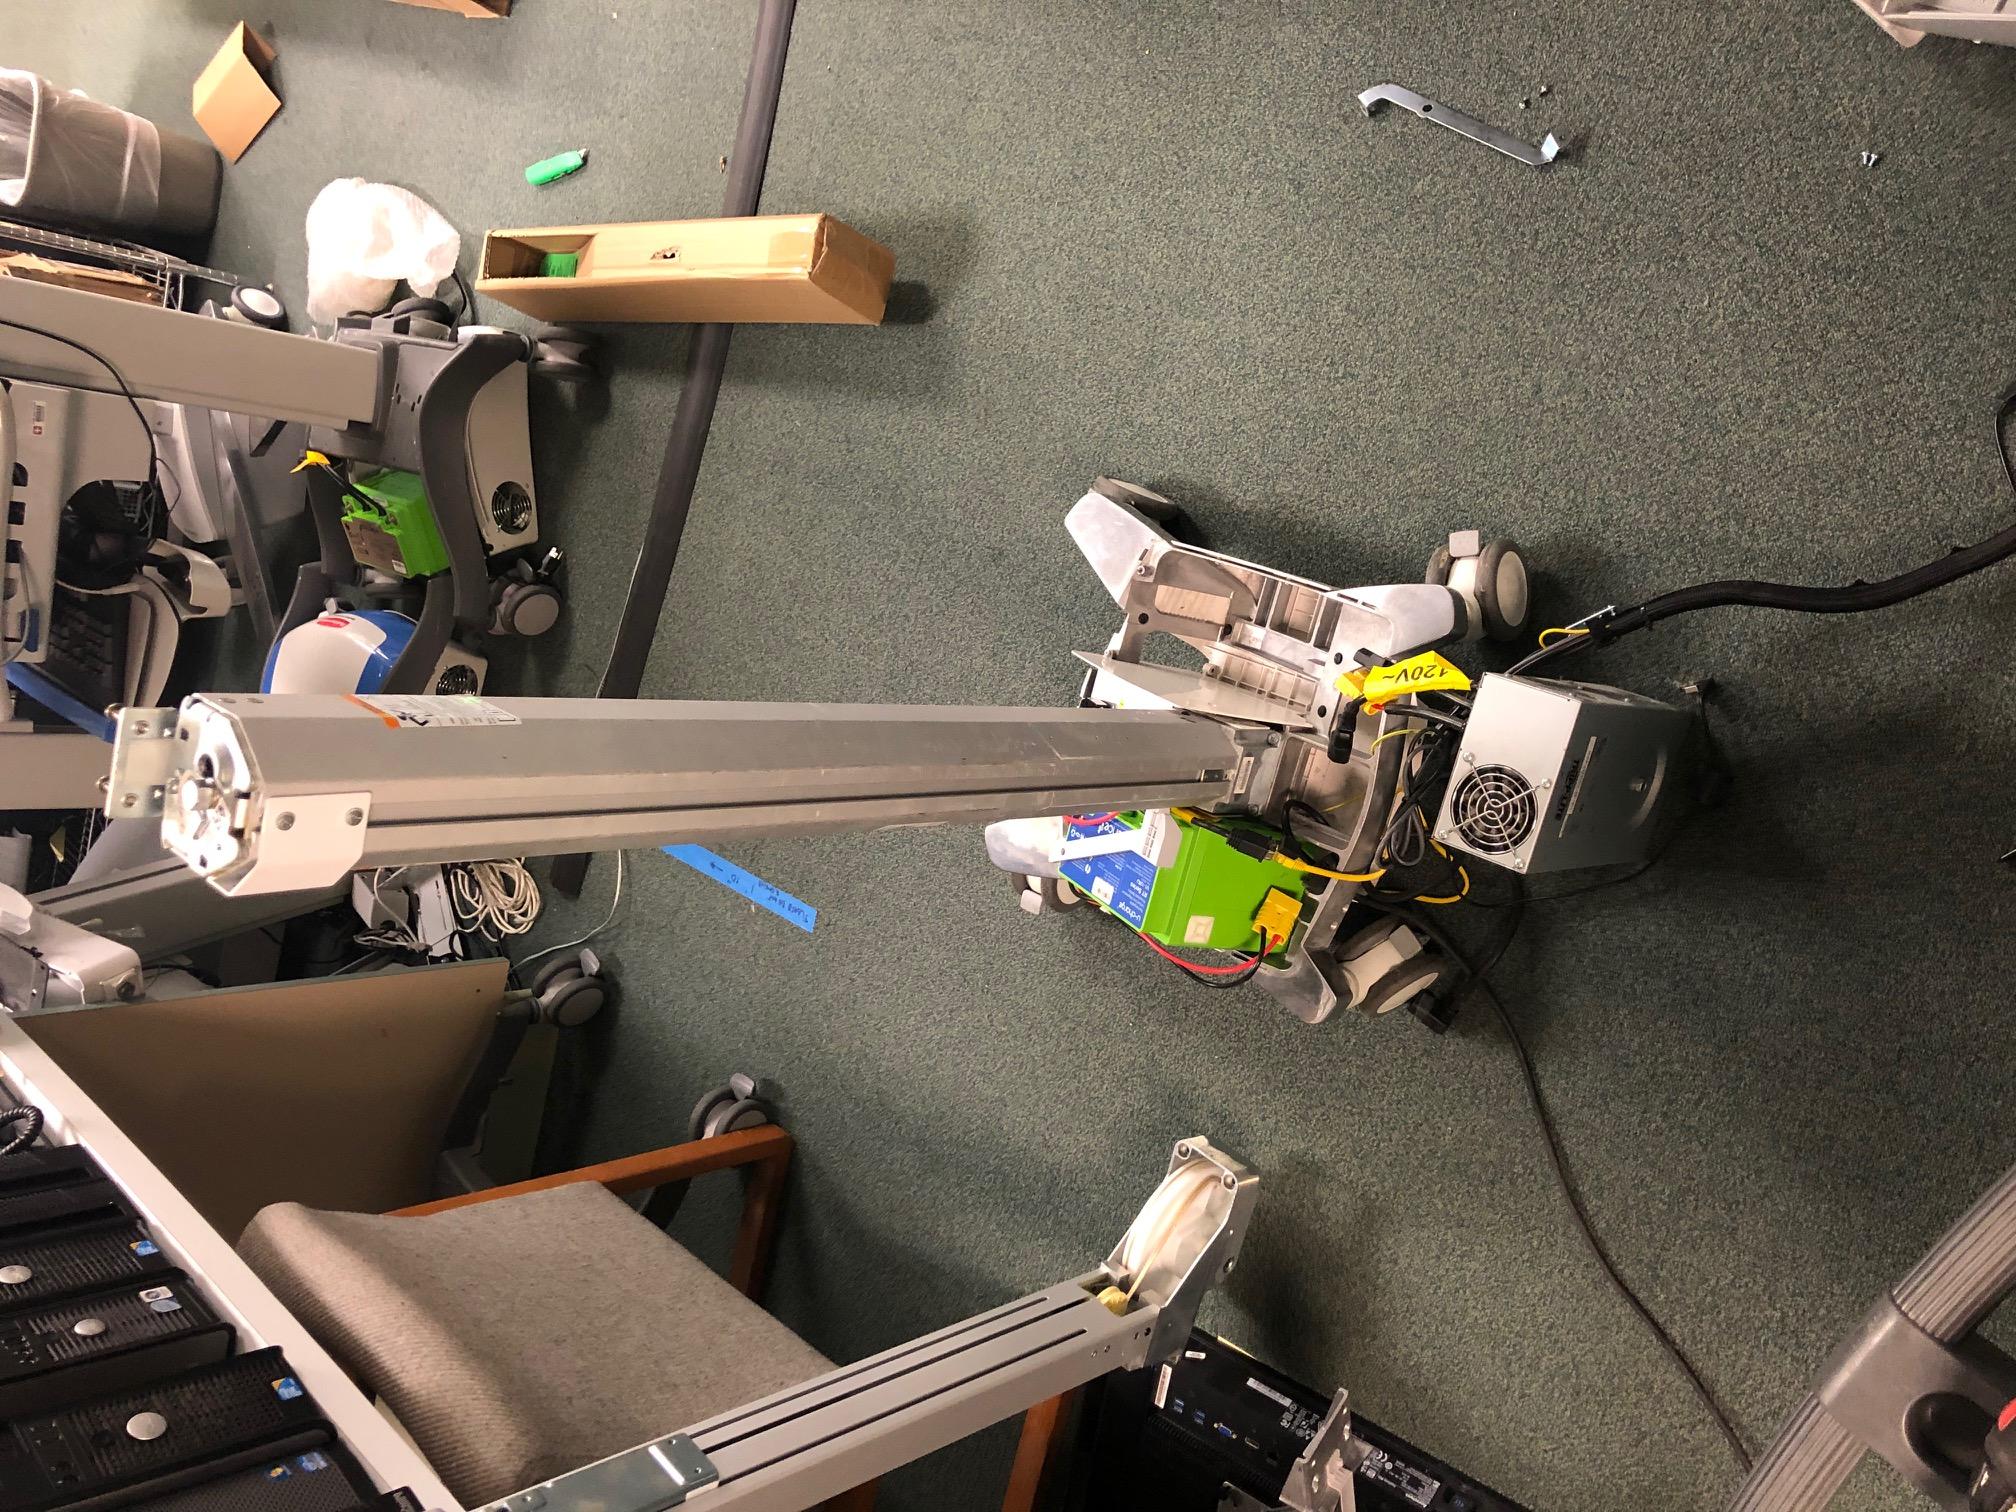 Cart Troubleshooting and Repair